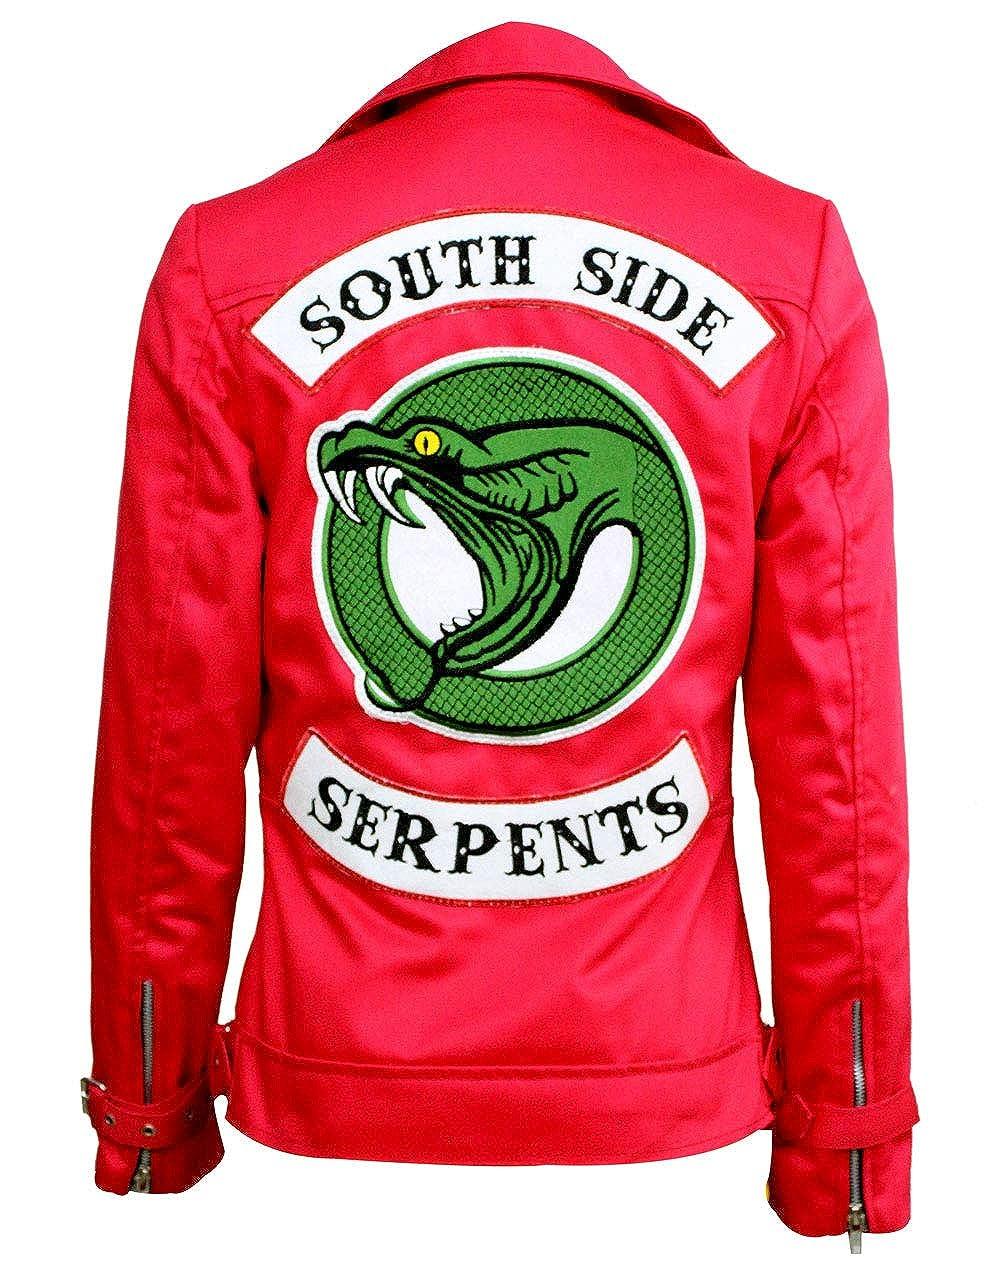 MJ Donna Red Cherry Riverdale Southside Snakes Cheryl Blossom Giacca  Madelaine Petsch  Amazon.it  Abbigliamento 1db686c962c